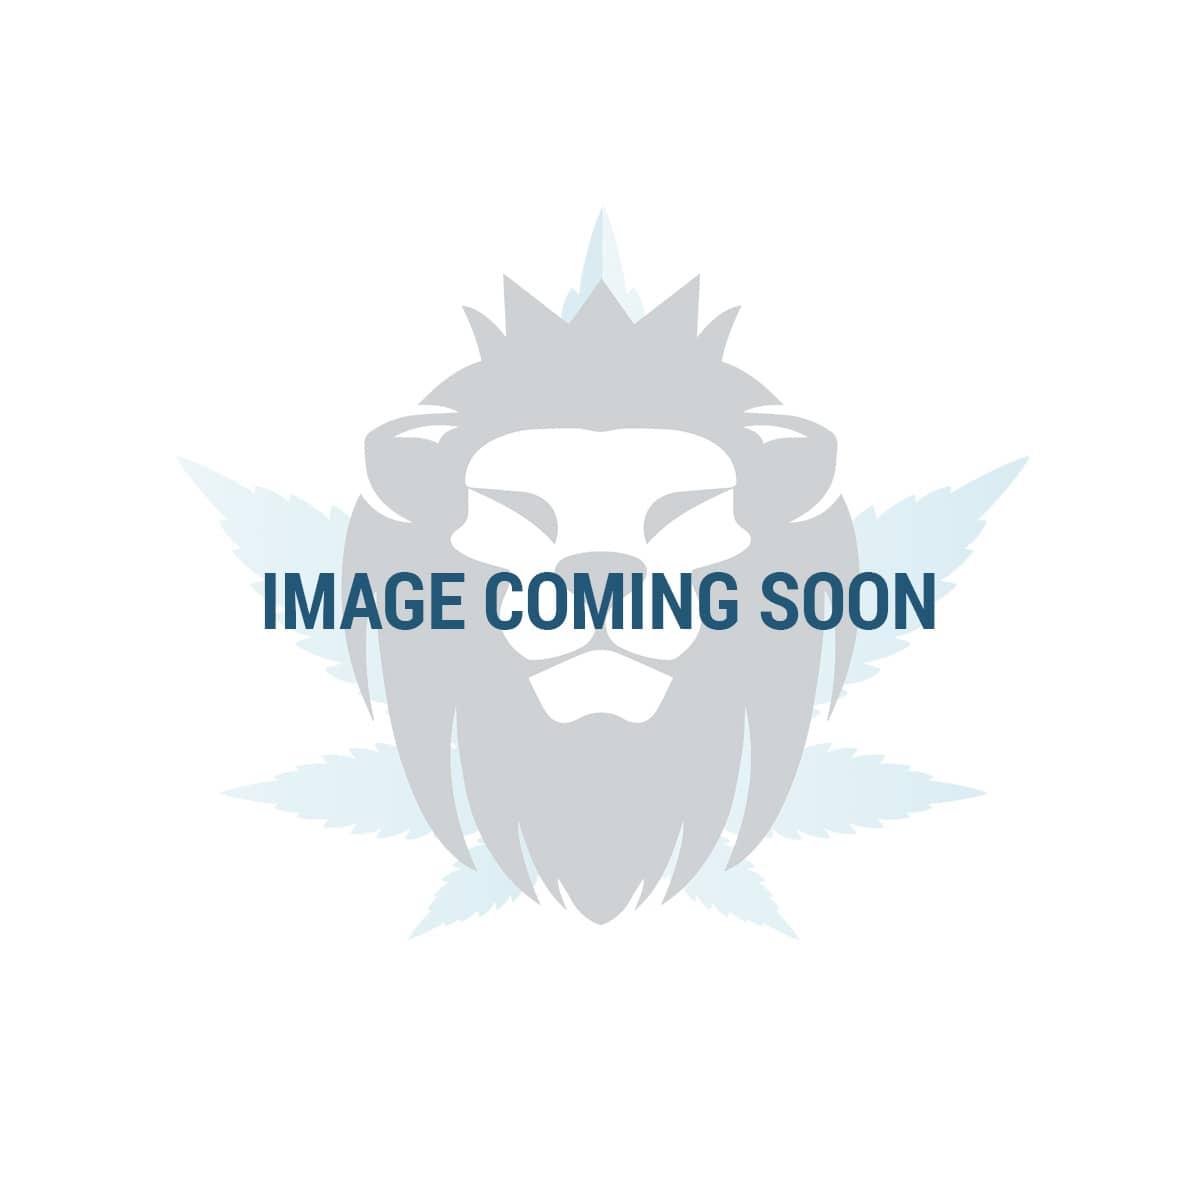 CBD Body Balms & Lotions Gift Box